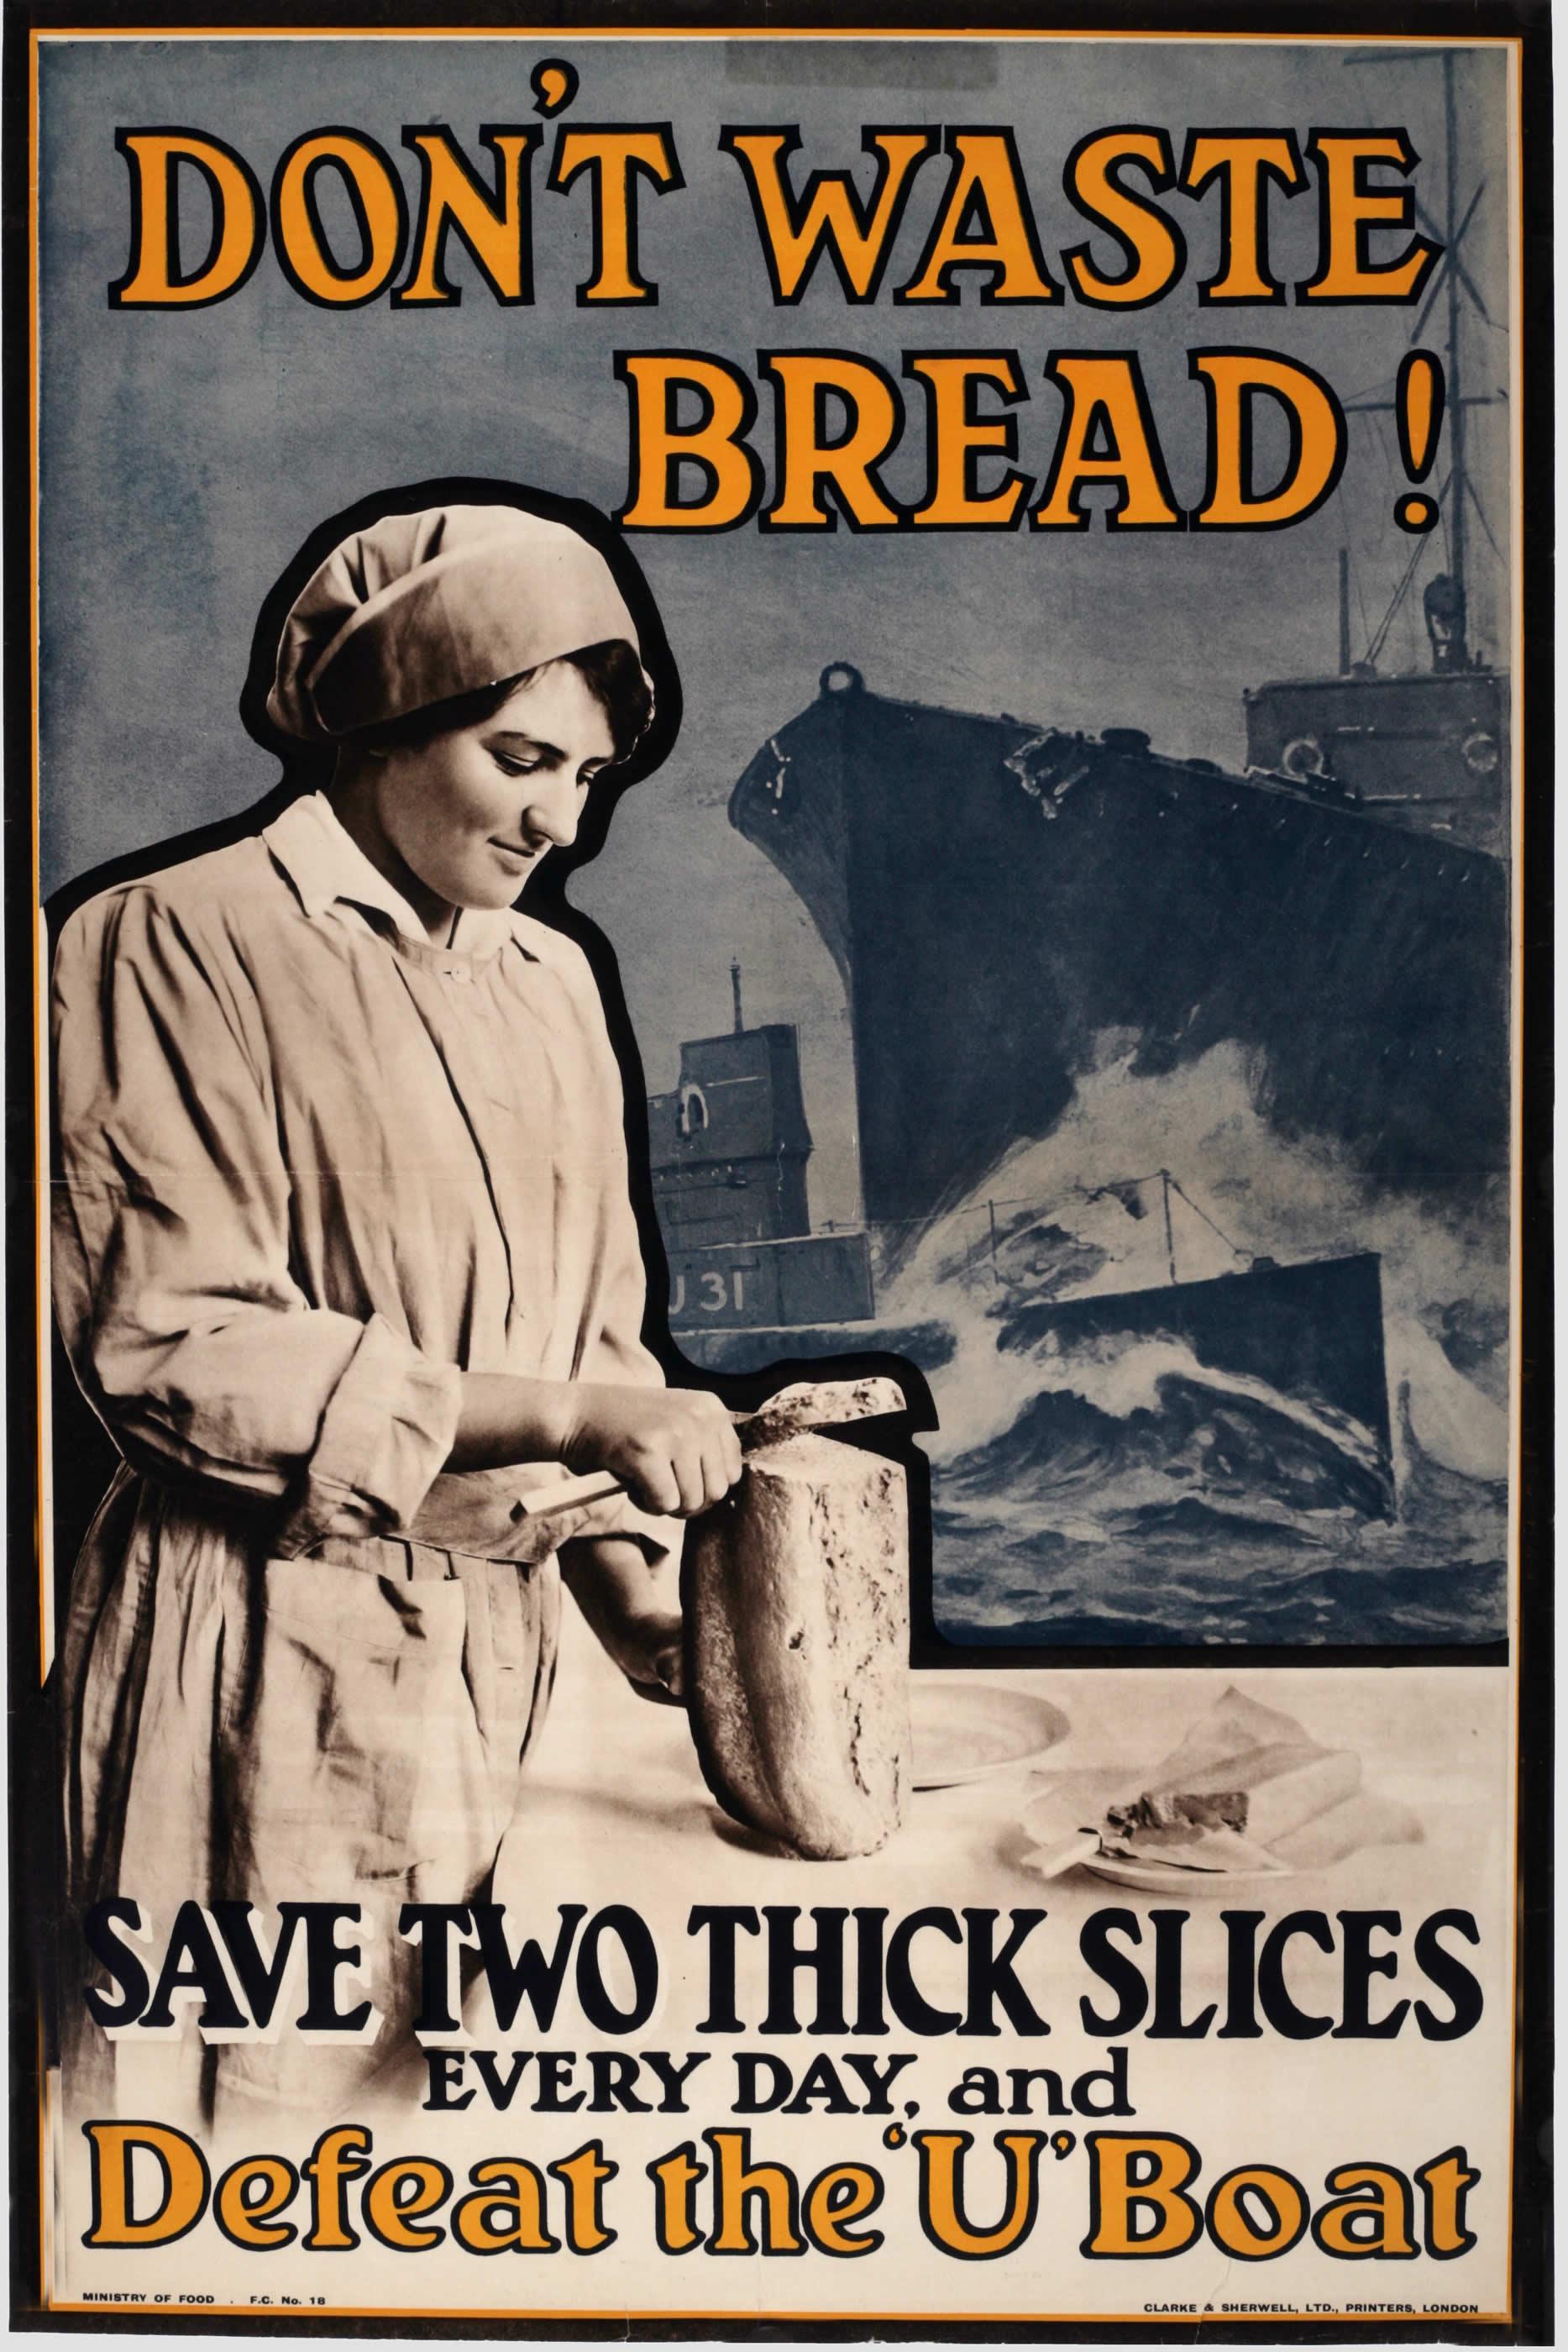 <i>Ne gaspillez pas le pain!</i>